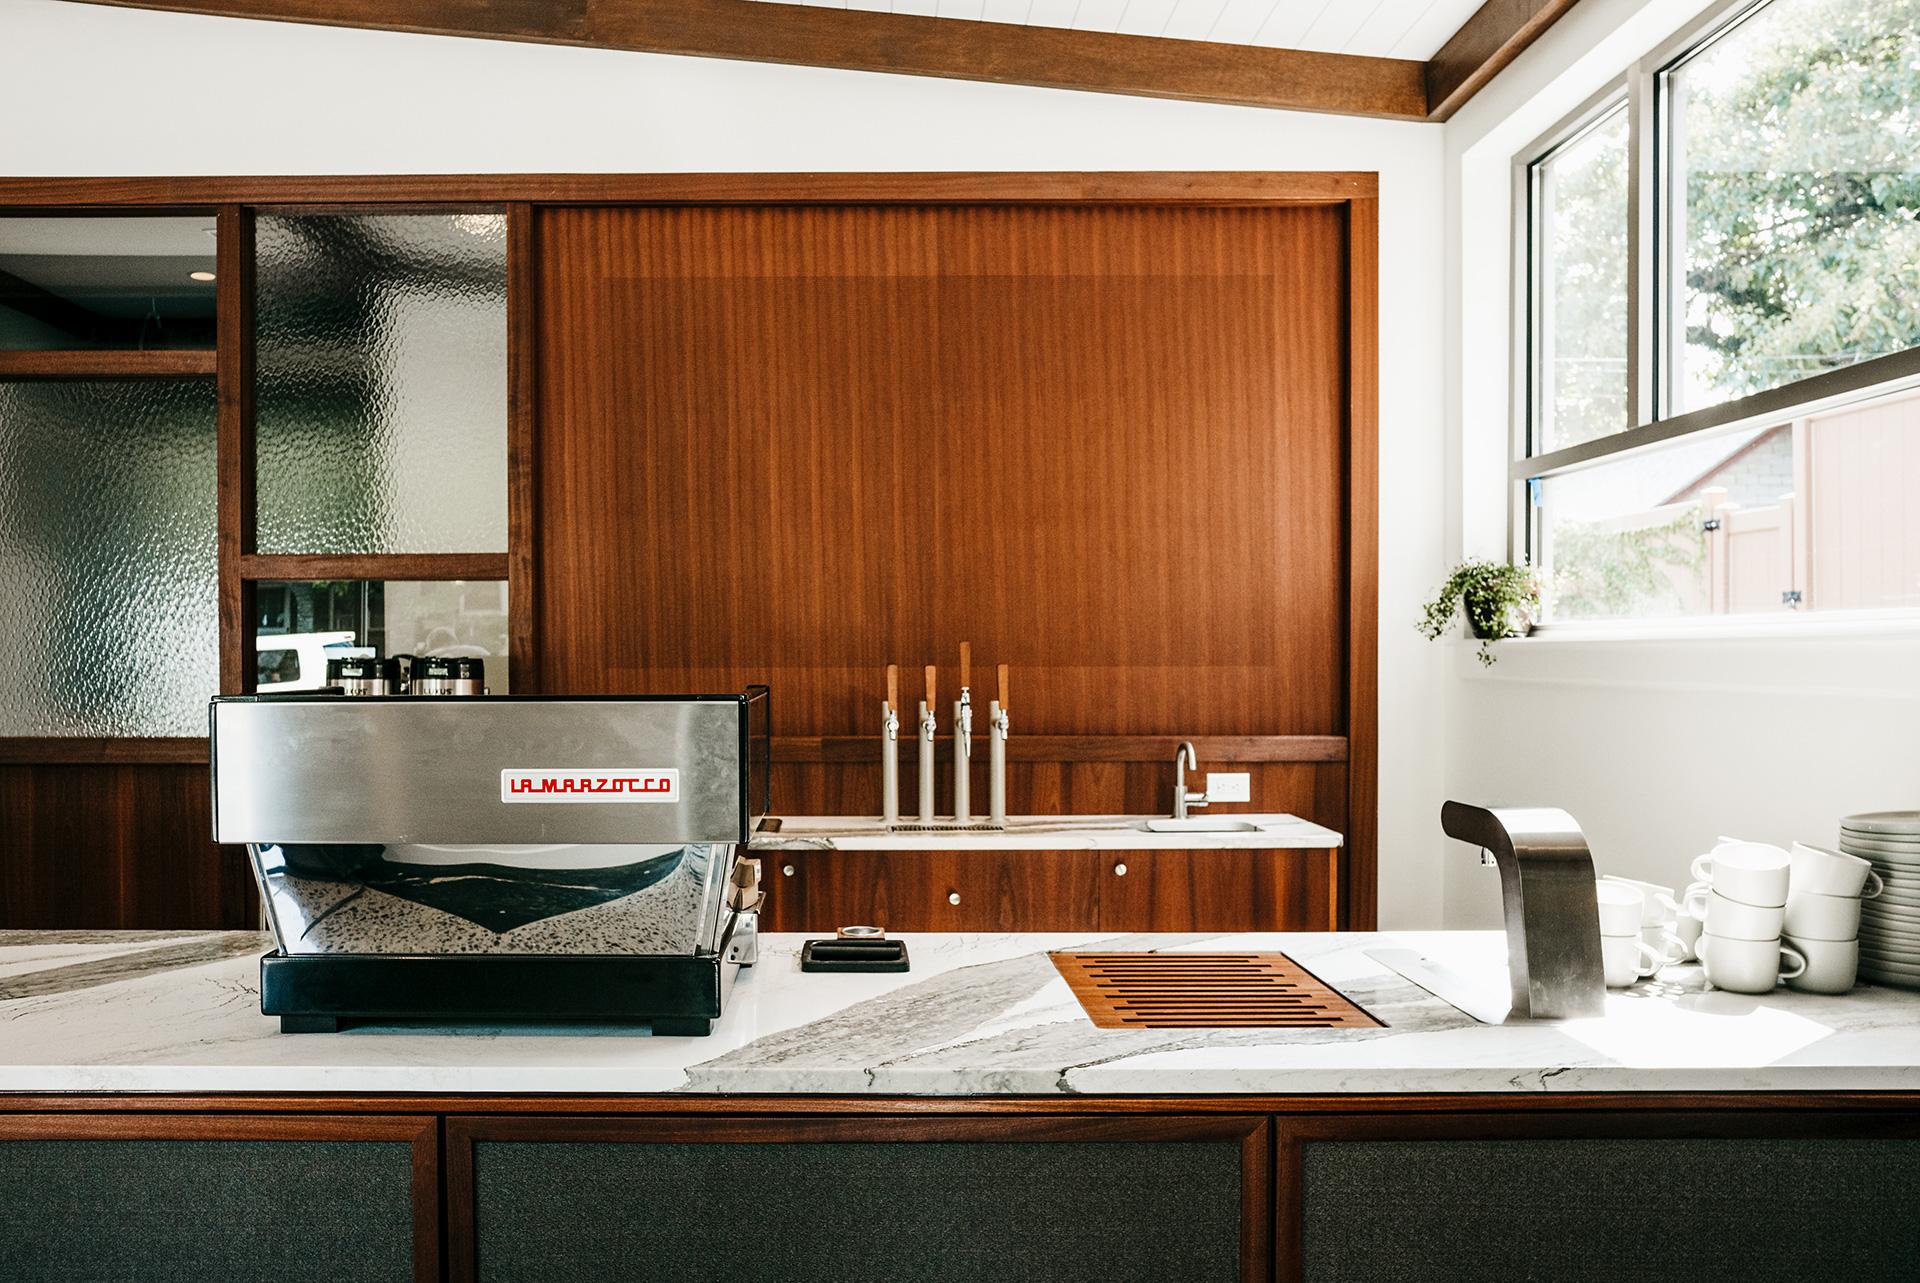 passenger coffee lancaster pennsylvania